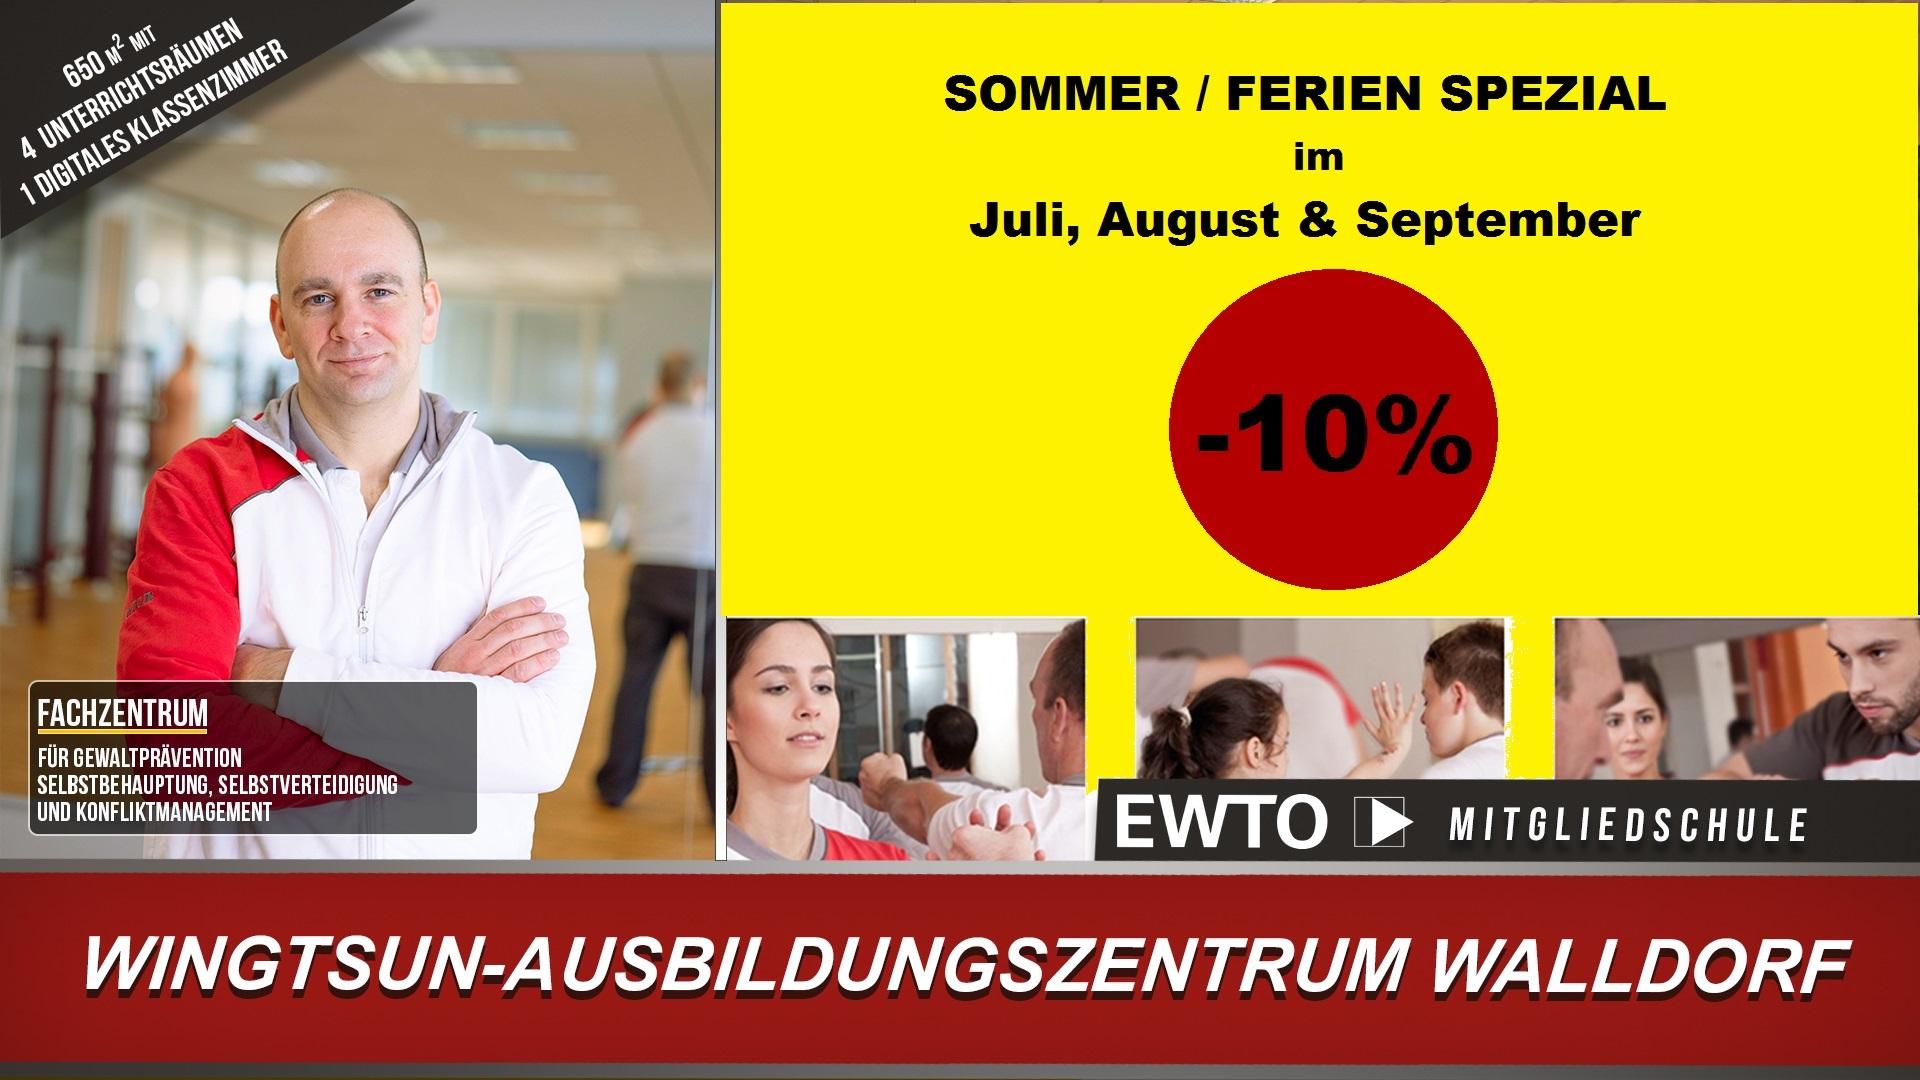 WingTsun Walldorf - 10 % Sommeraktion